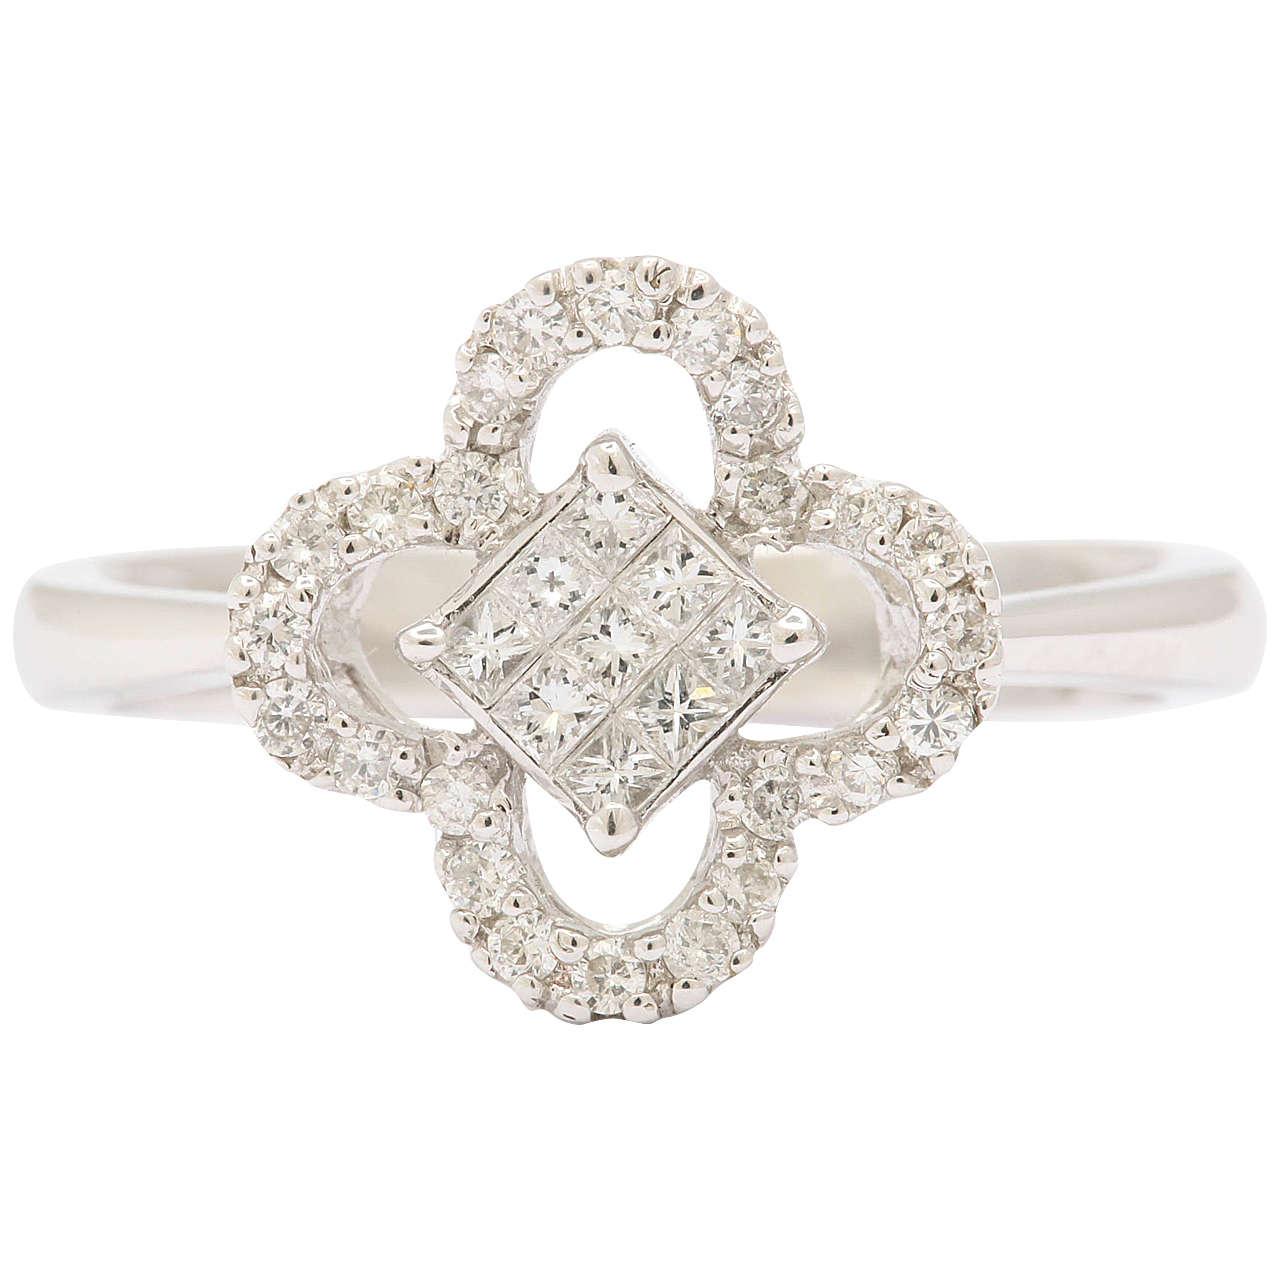 Invisibly Set Diamond Gold Ring